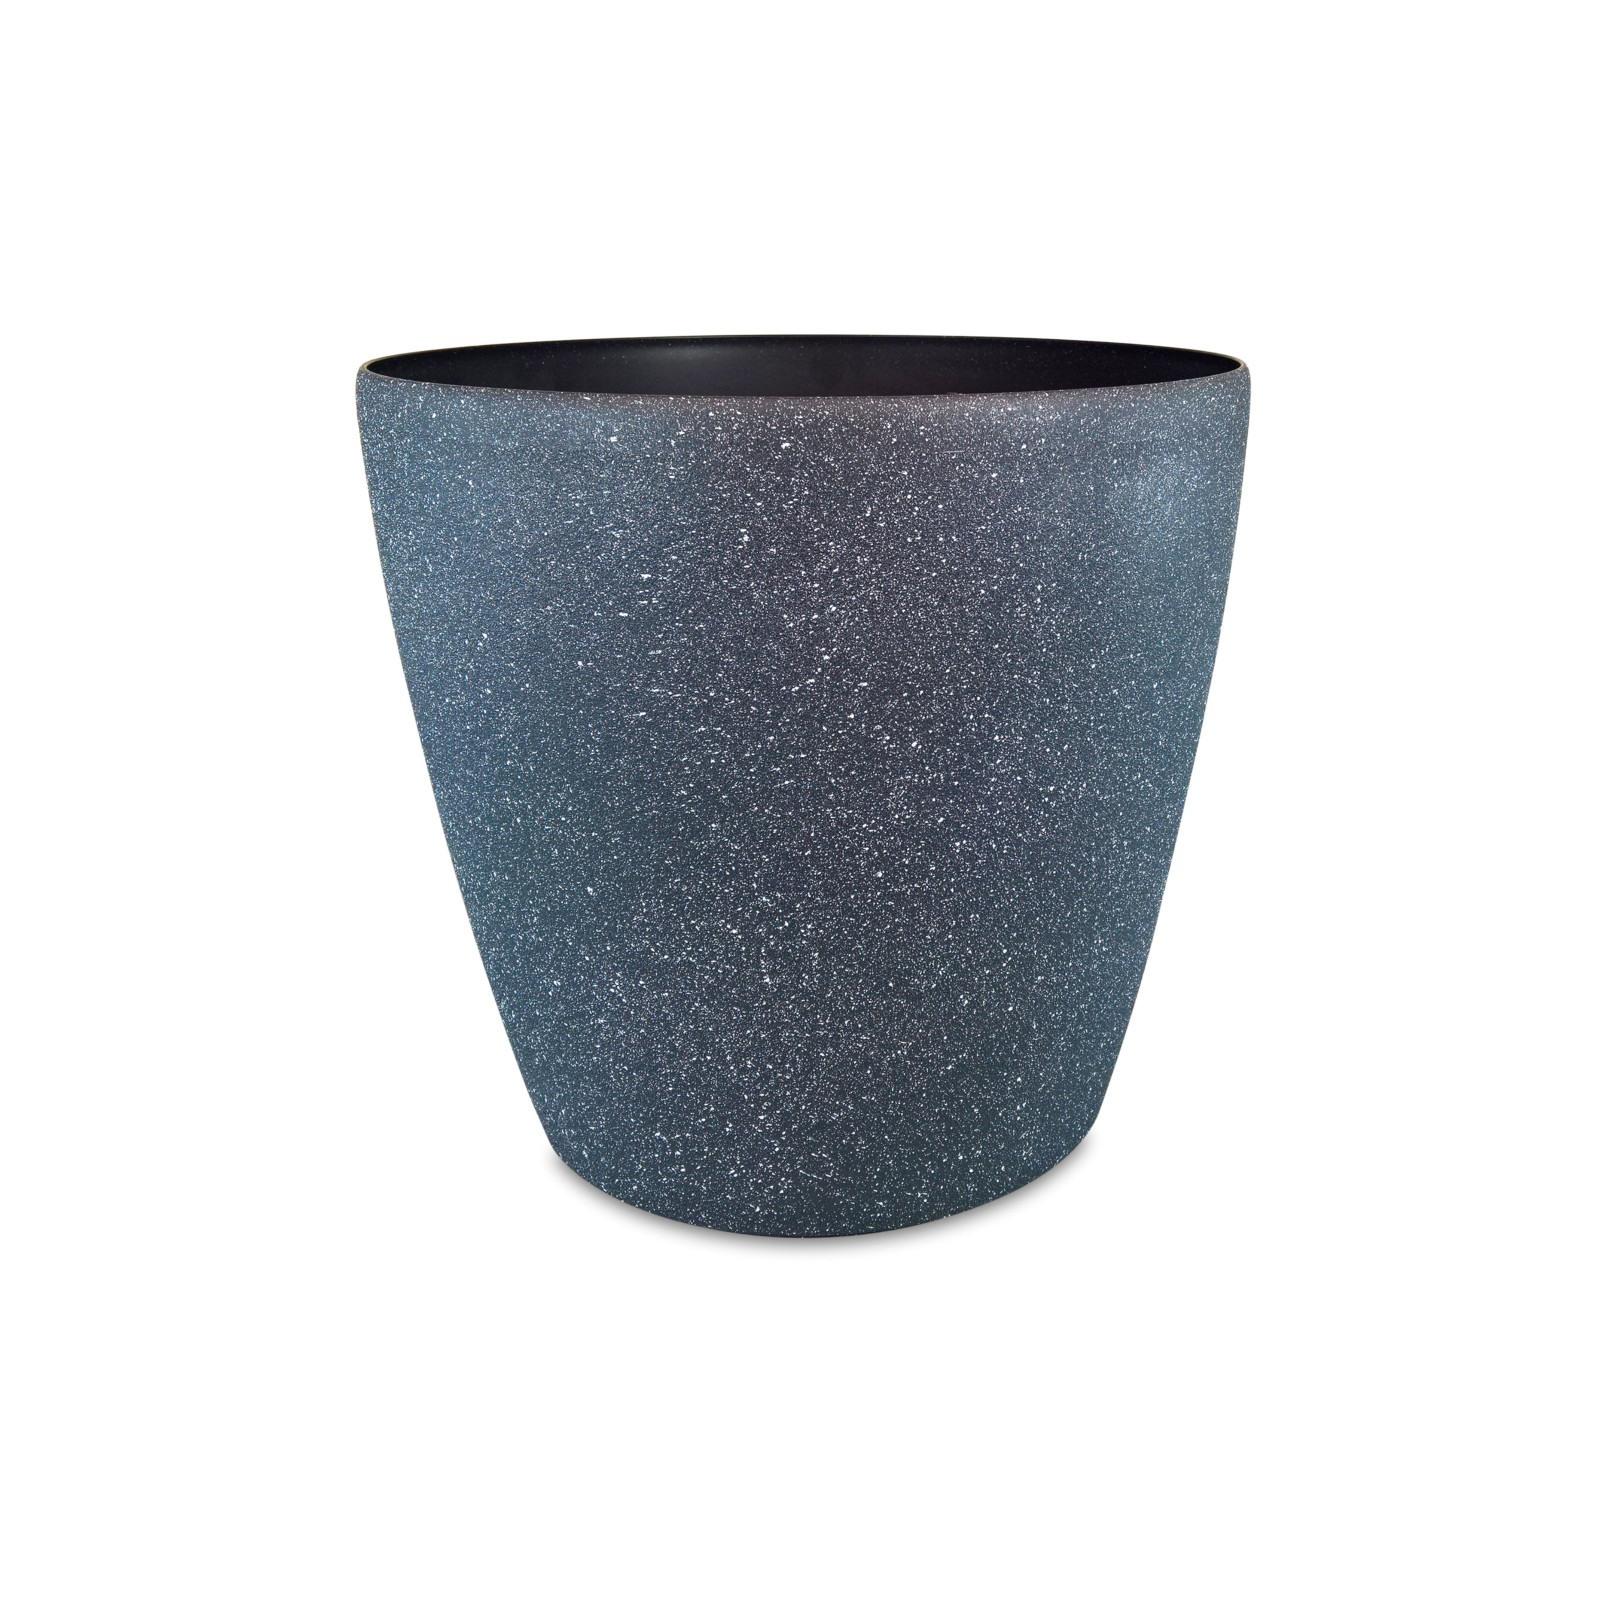 EDEN 22 x 20cm Granite Round Self Watering Planter